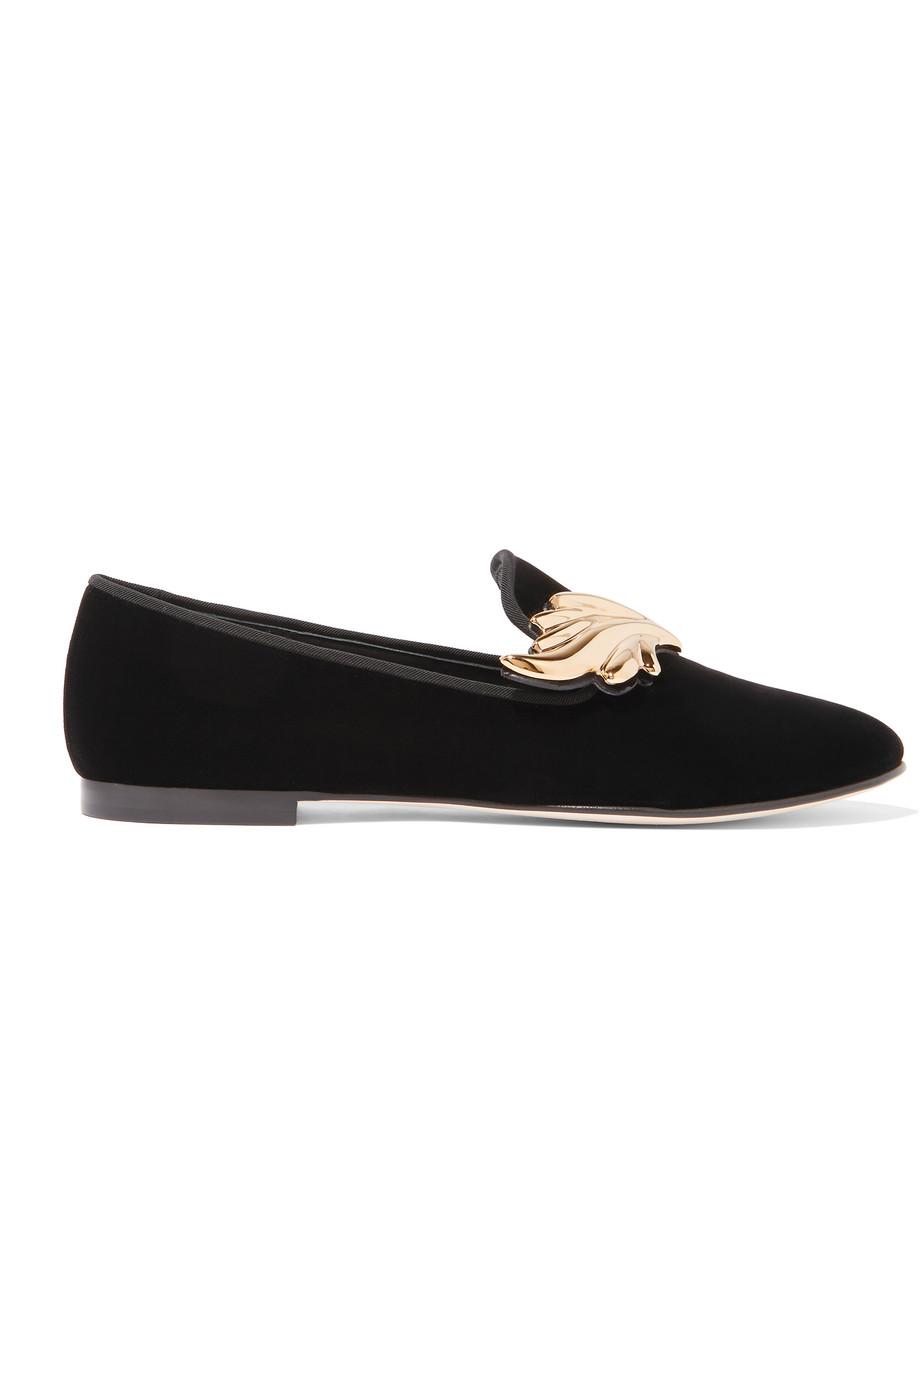 Giuseppe Zanotti Embellished Velvet Loafers, Black, Women's US Size: 6, Size: 36.5